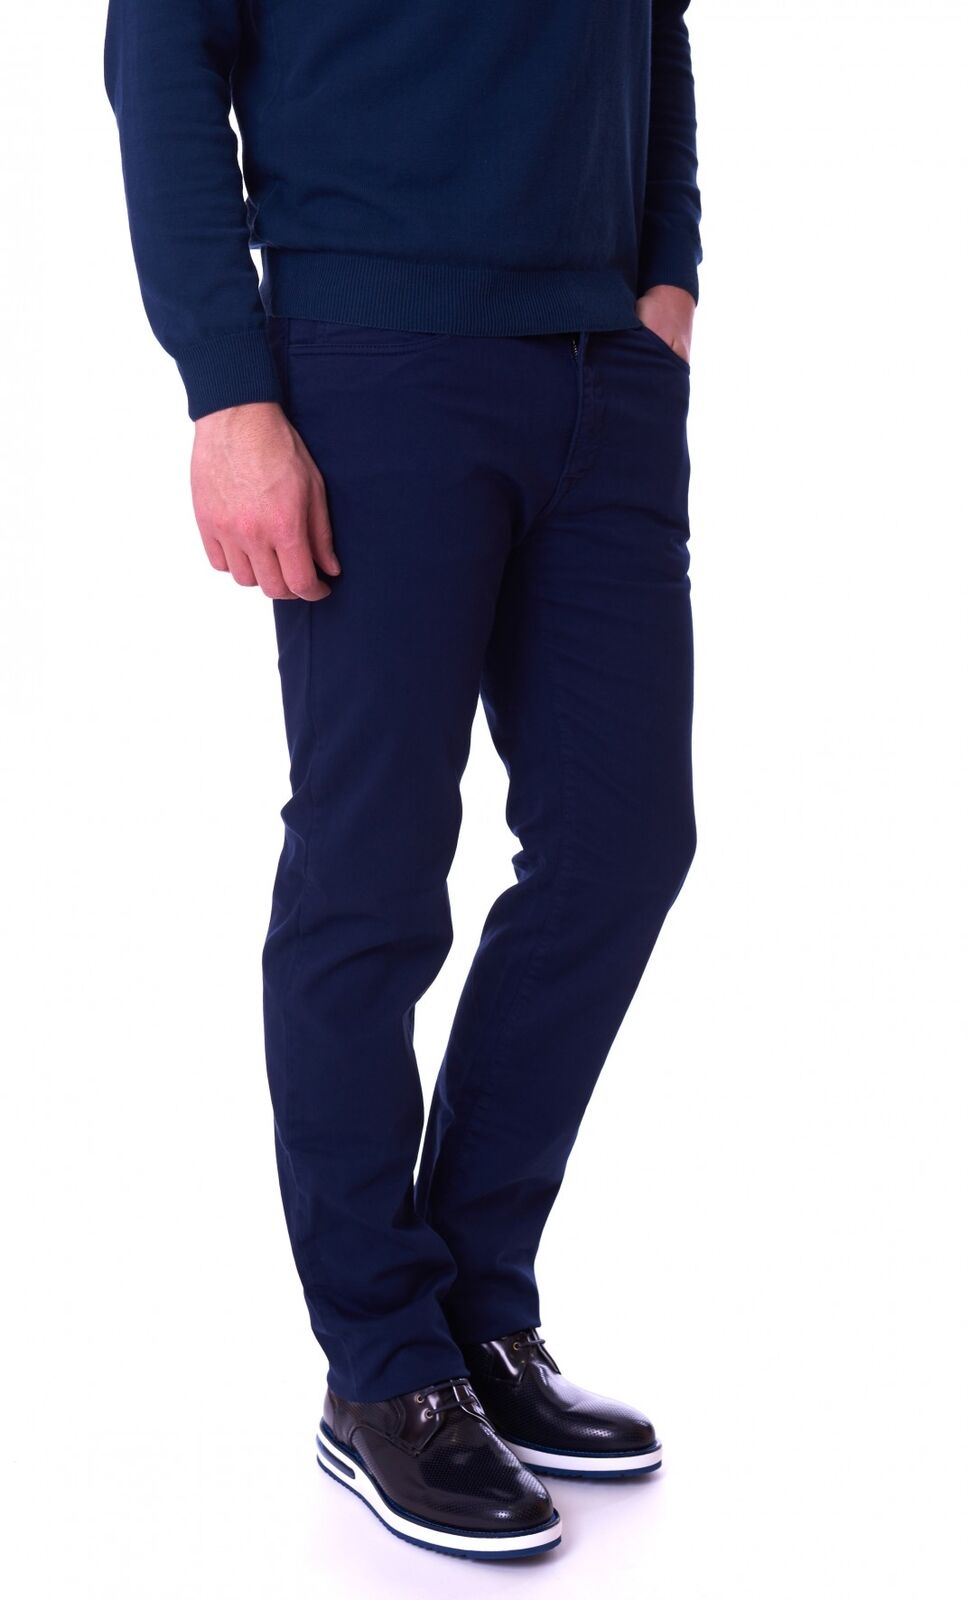 PANTALONE TRUSSARDI JEANS 380 ICON IN COTONE blue Trussardi Jeans 52J00004-1Y0905